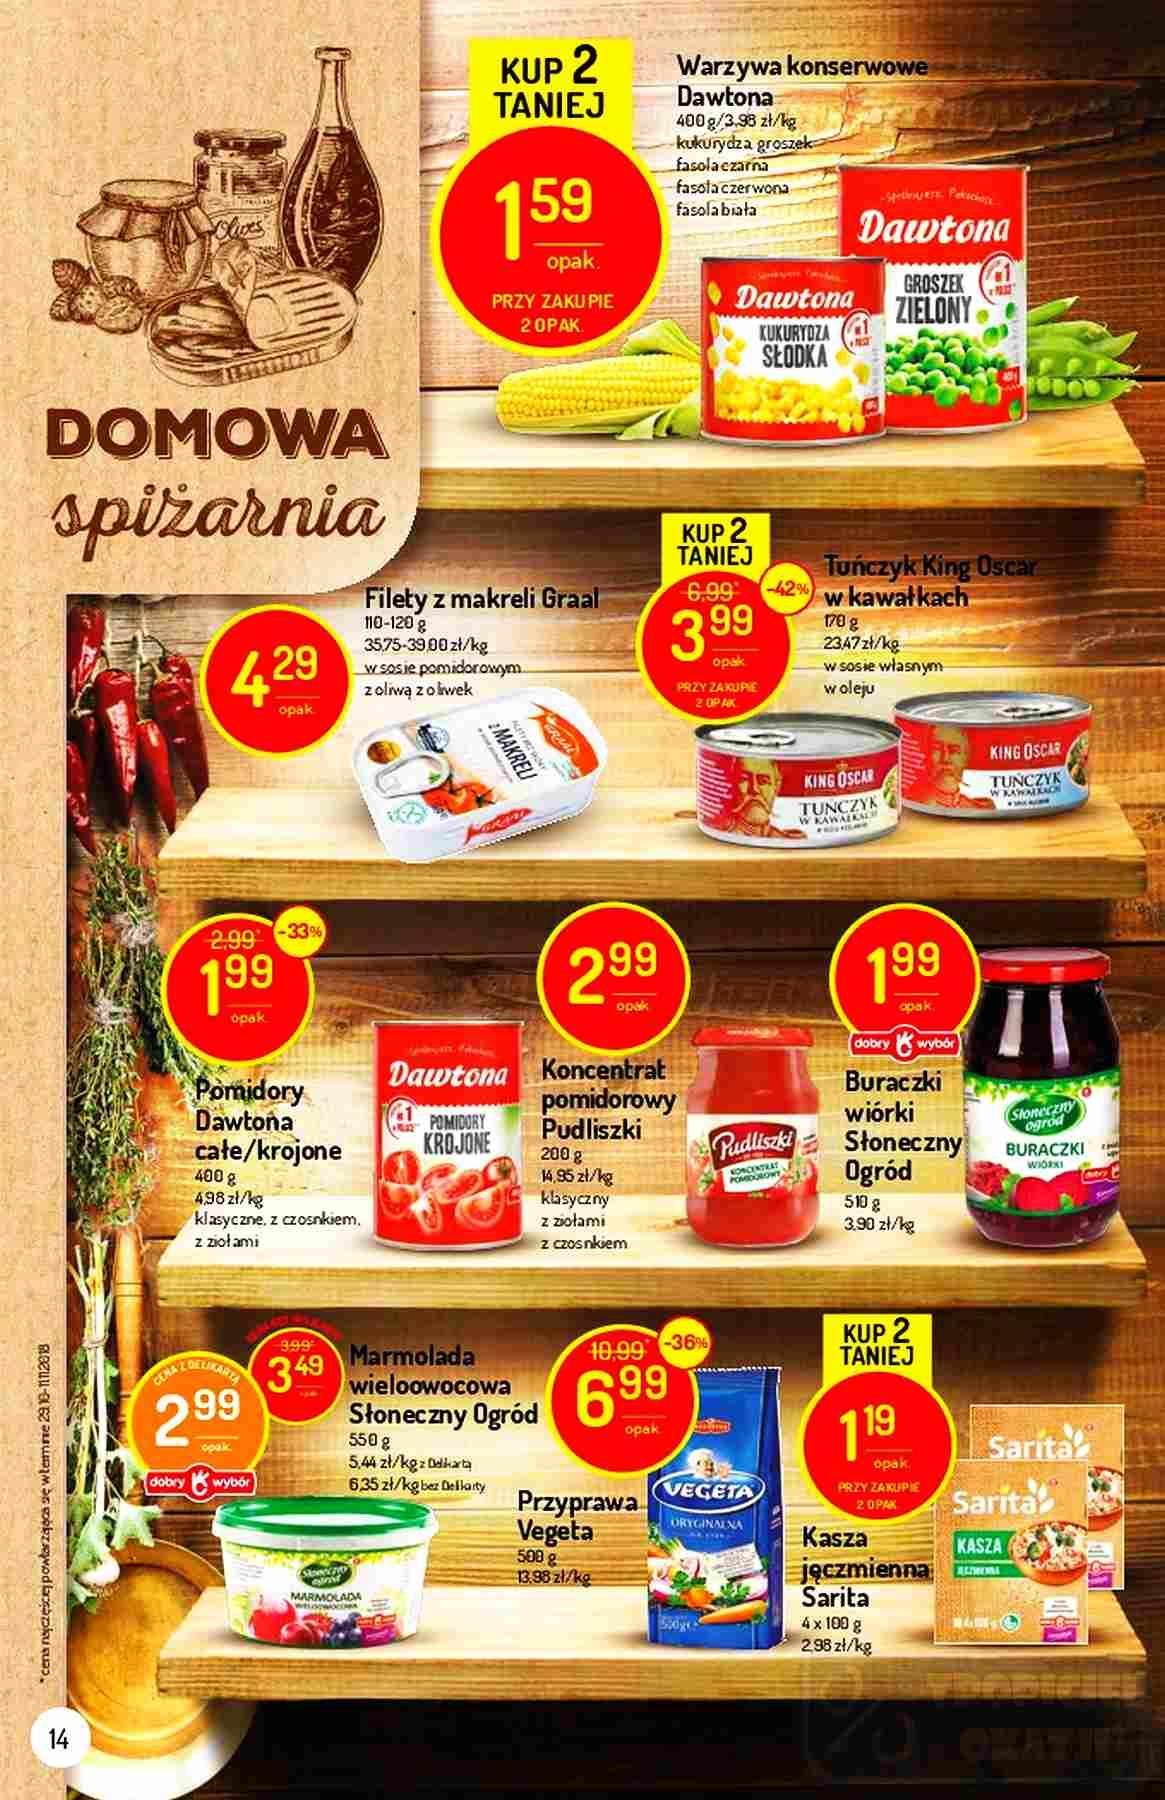 Gazetka promocyjna Delikatesy Centrum do 12/12/2018 str.13